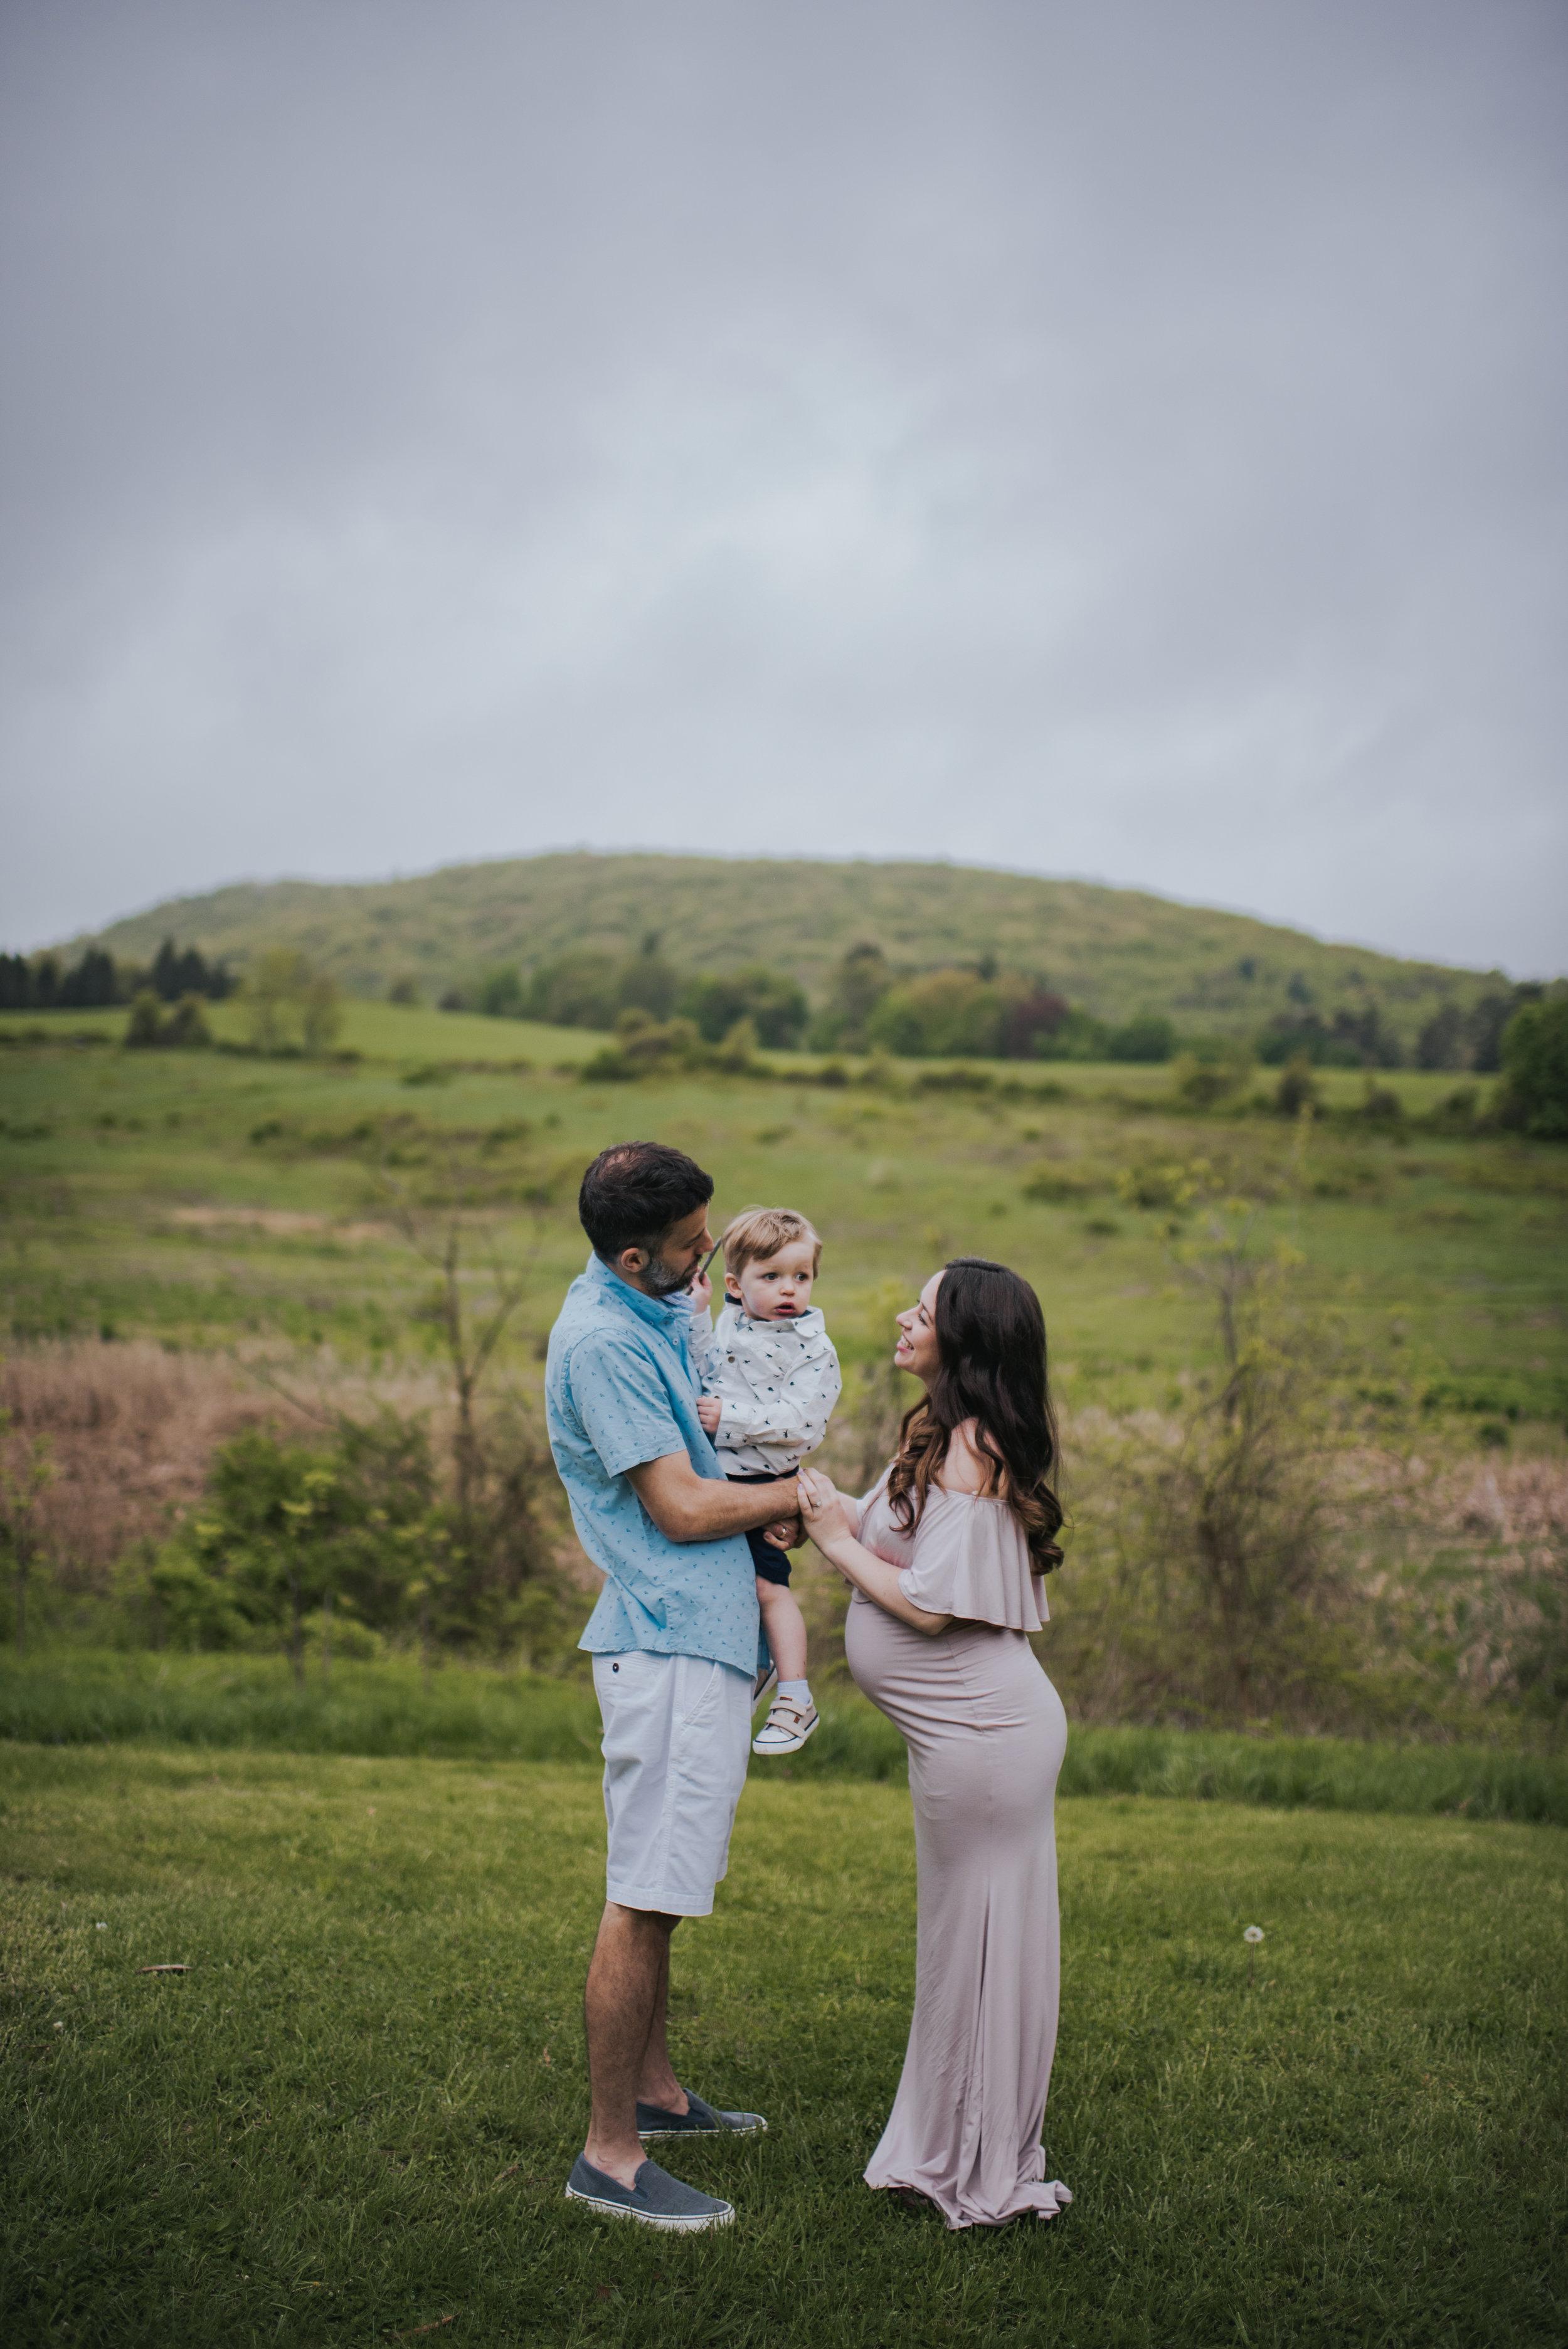 ridgefieldnewbornandfamilyphotographerkendraconroyphotography